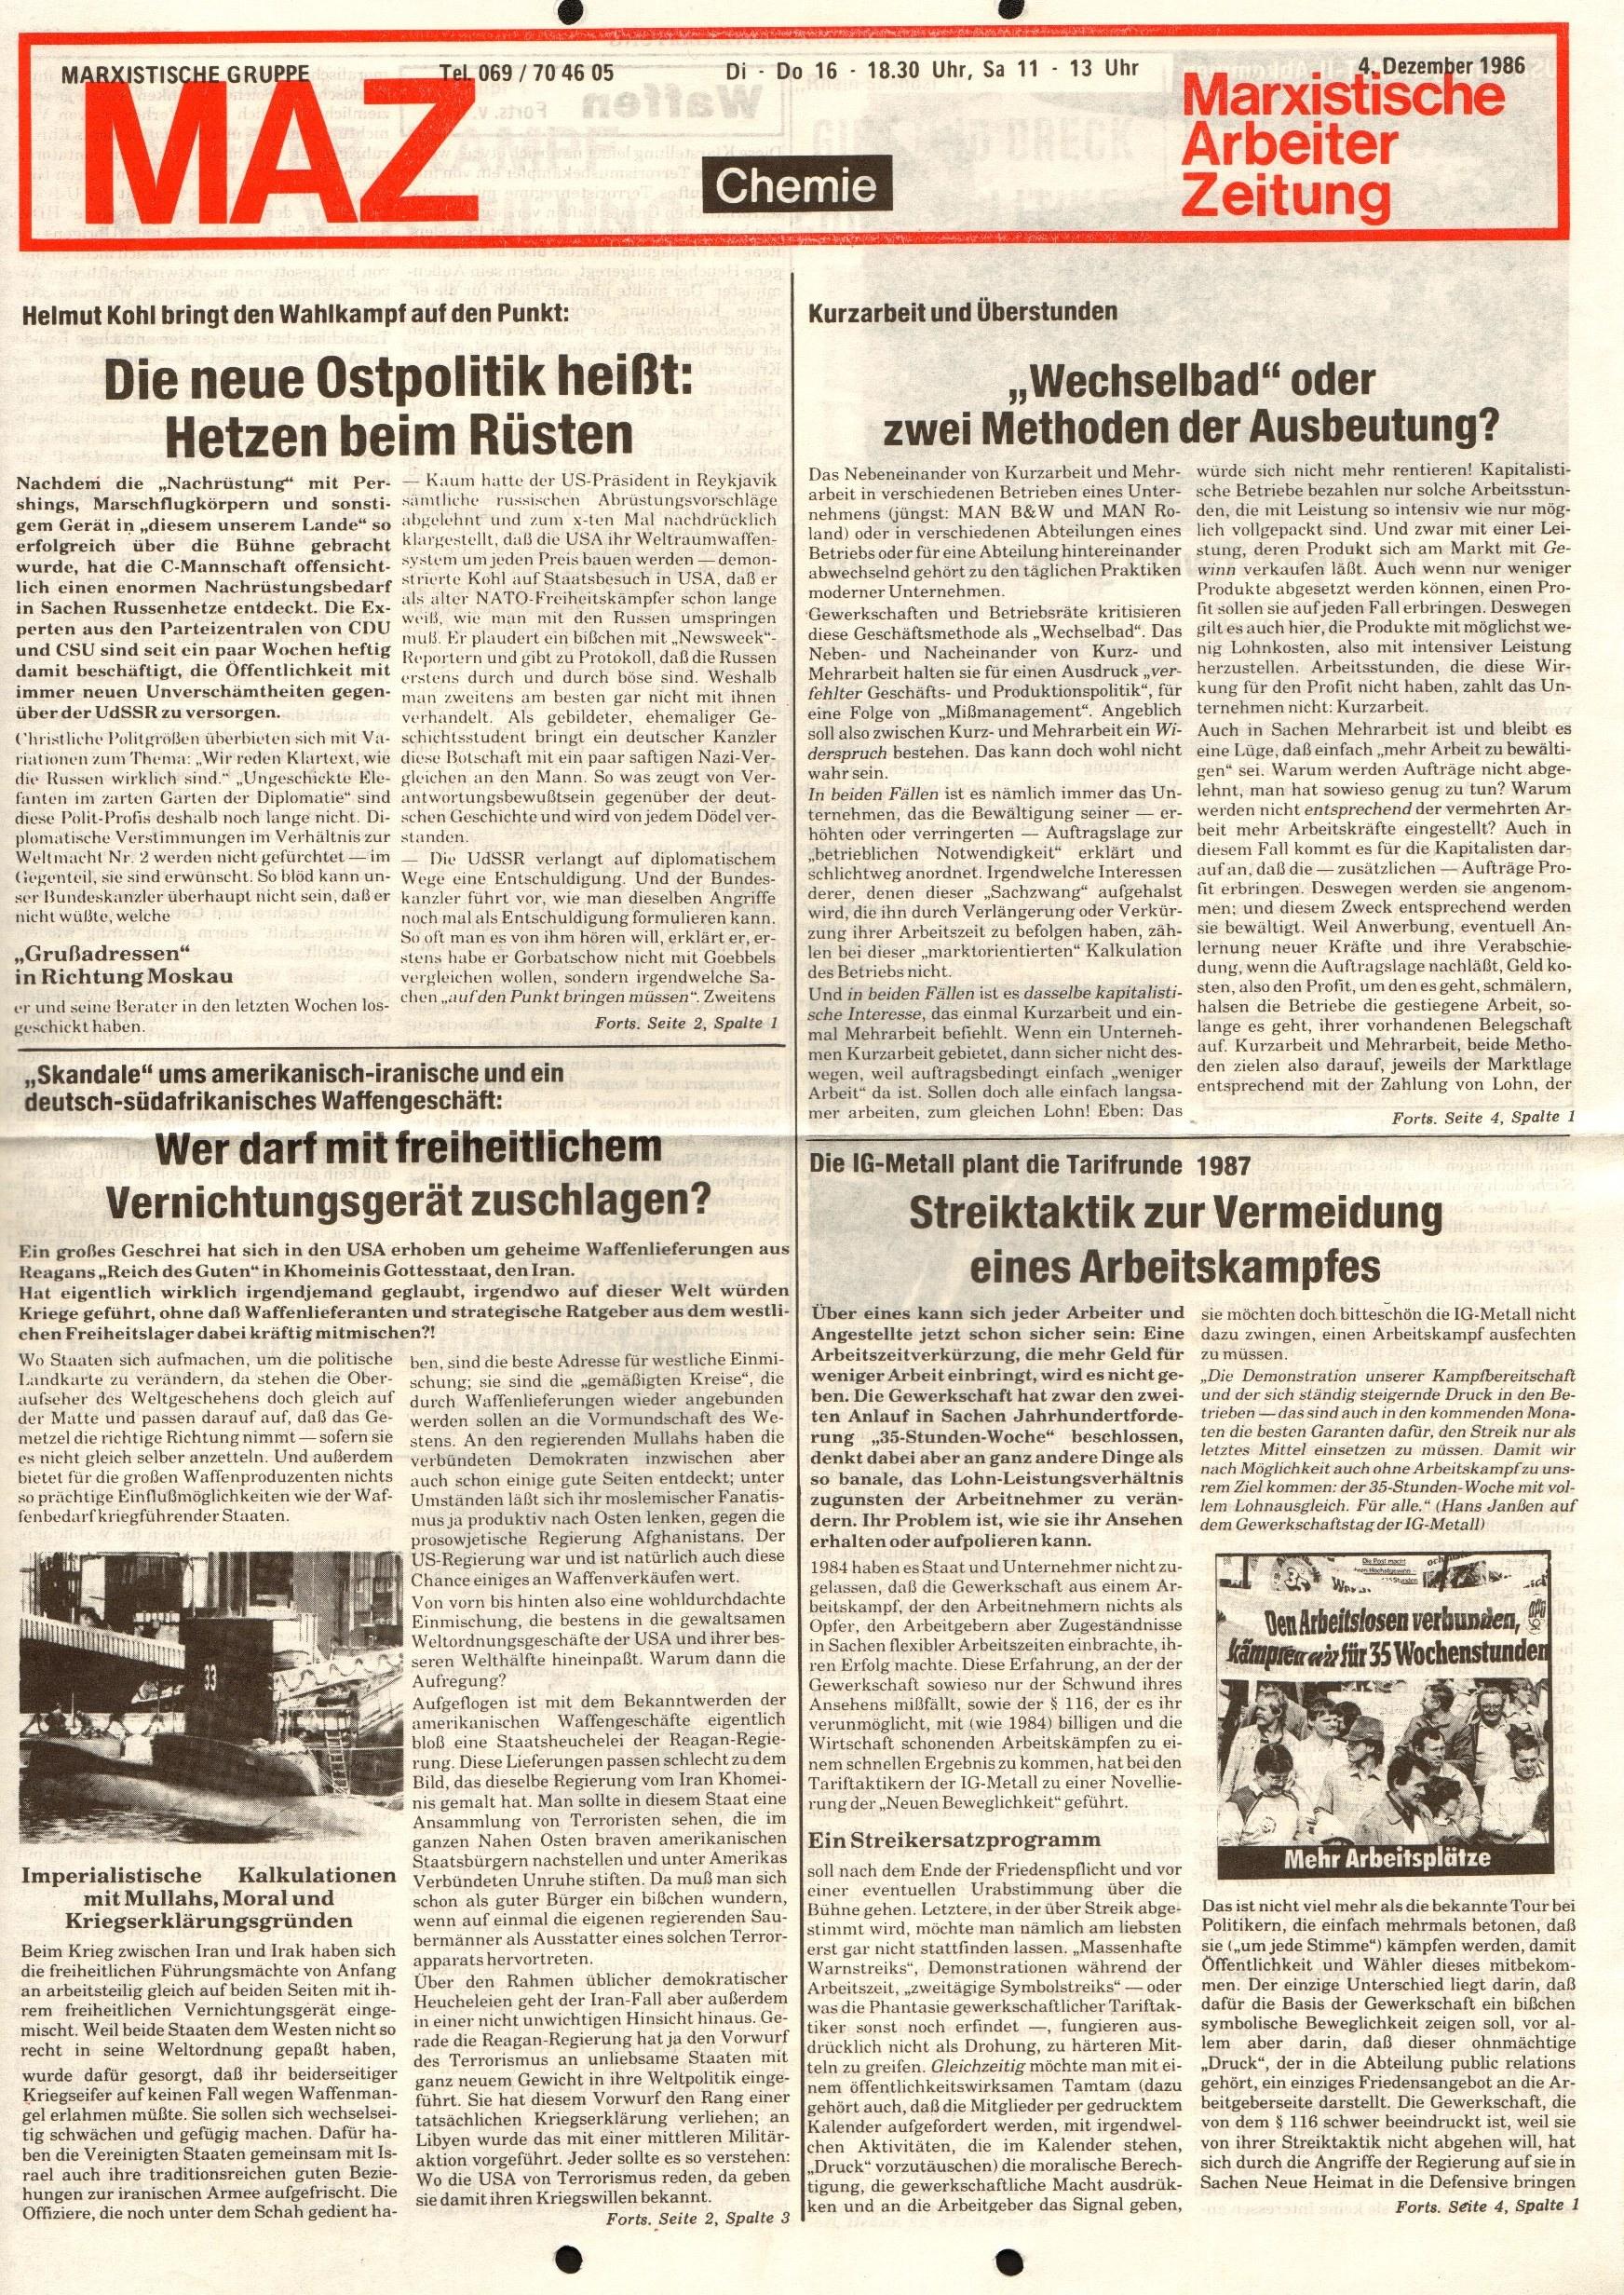 Frankfurt_CPK_Hoechst_MAZ405